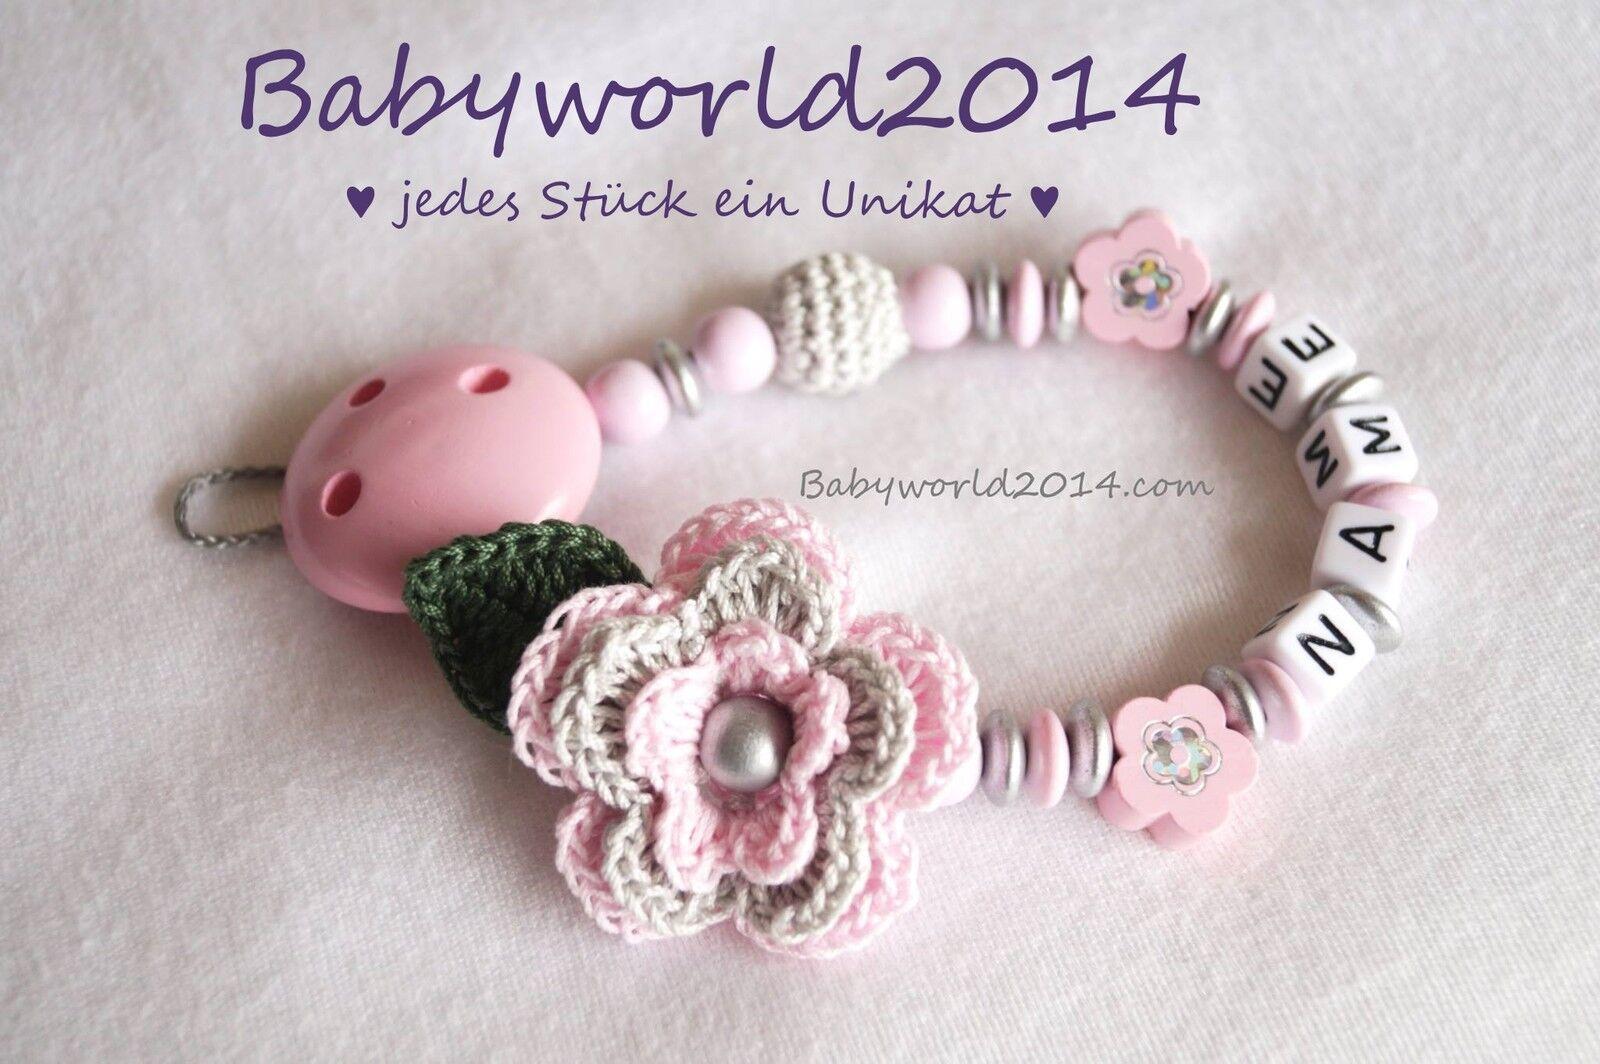 Babyworld_2014